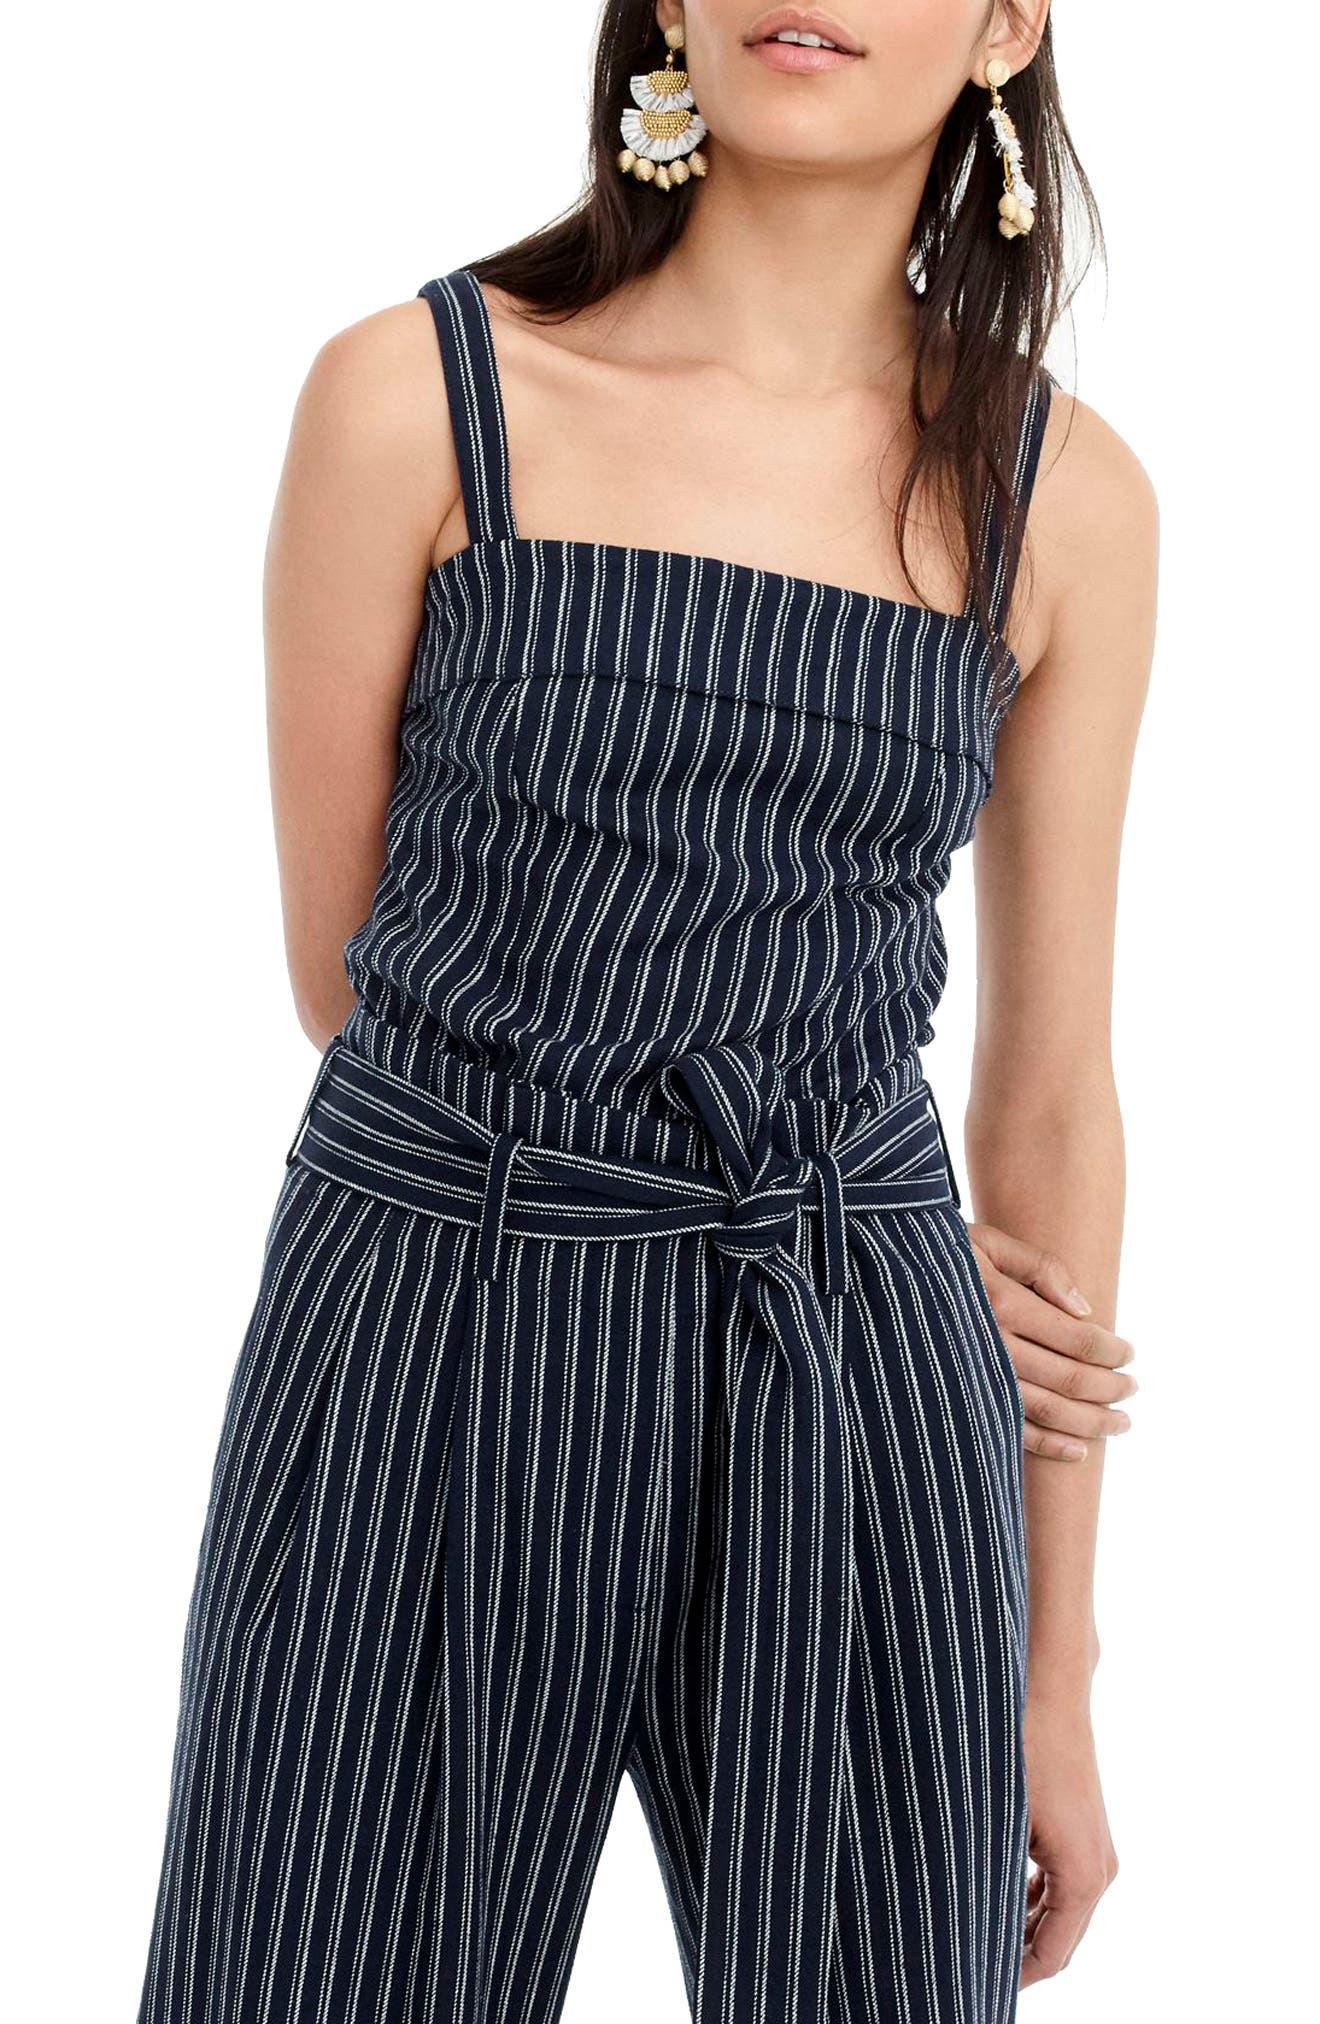 J.CREW,                             Turnover Stripe Linen & Cotton Top,                             Main thumbnail 1, color,                             400